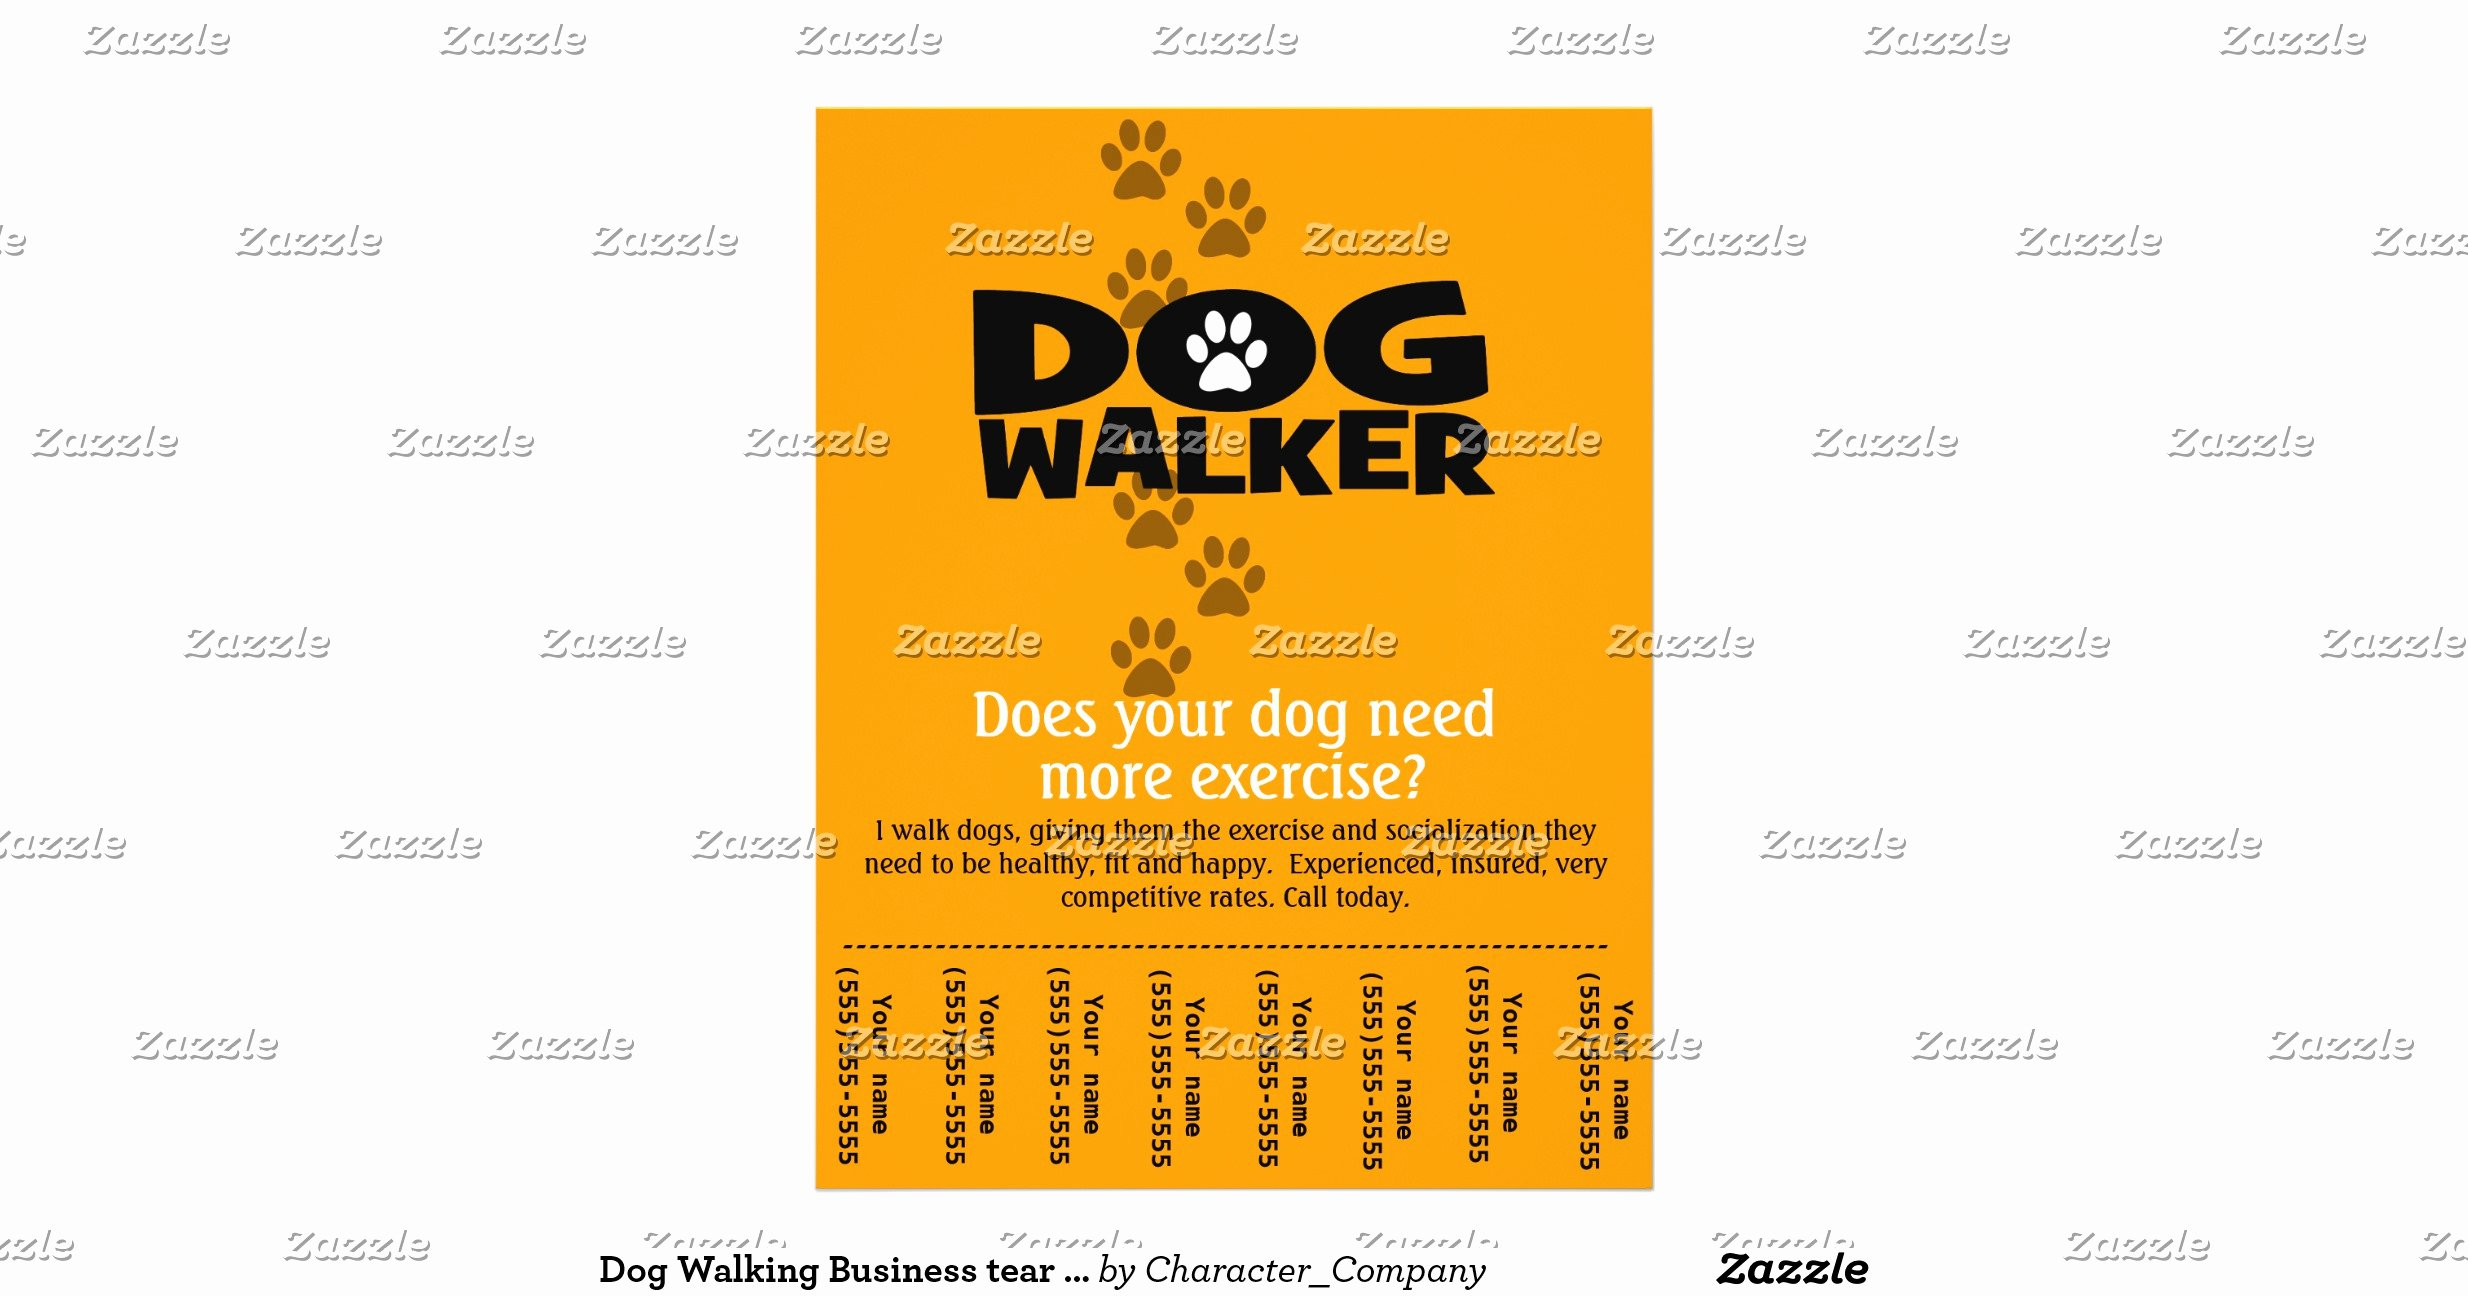 Free Dog Walking Flyer Template Awesome Dog Walking Business Tear Sheet Flyer Template